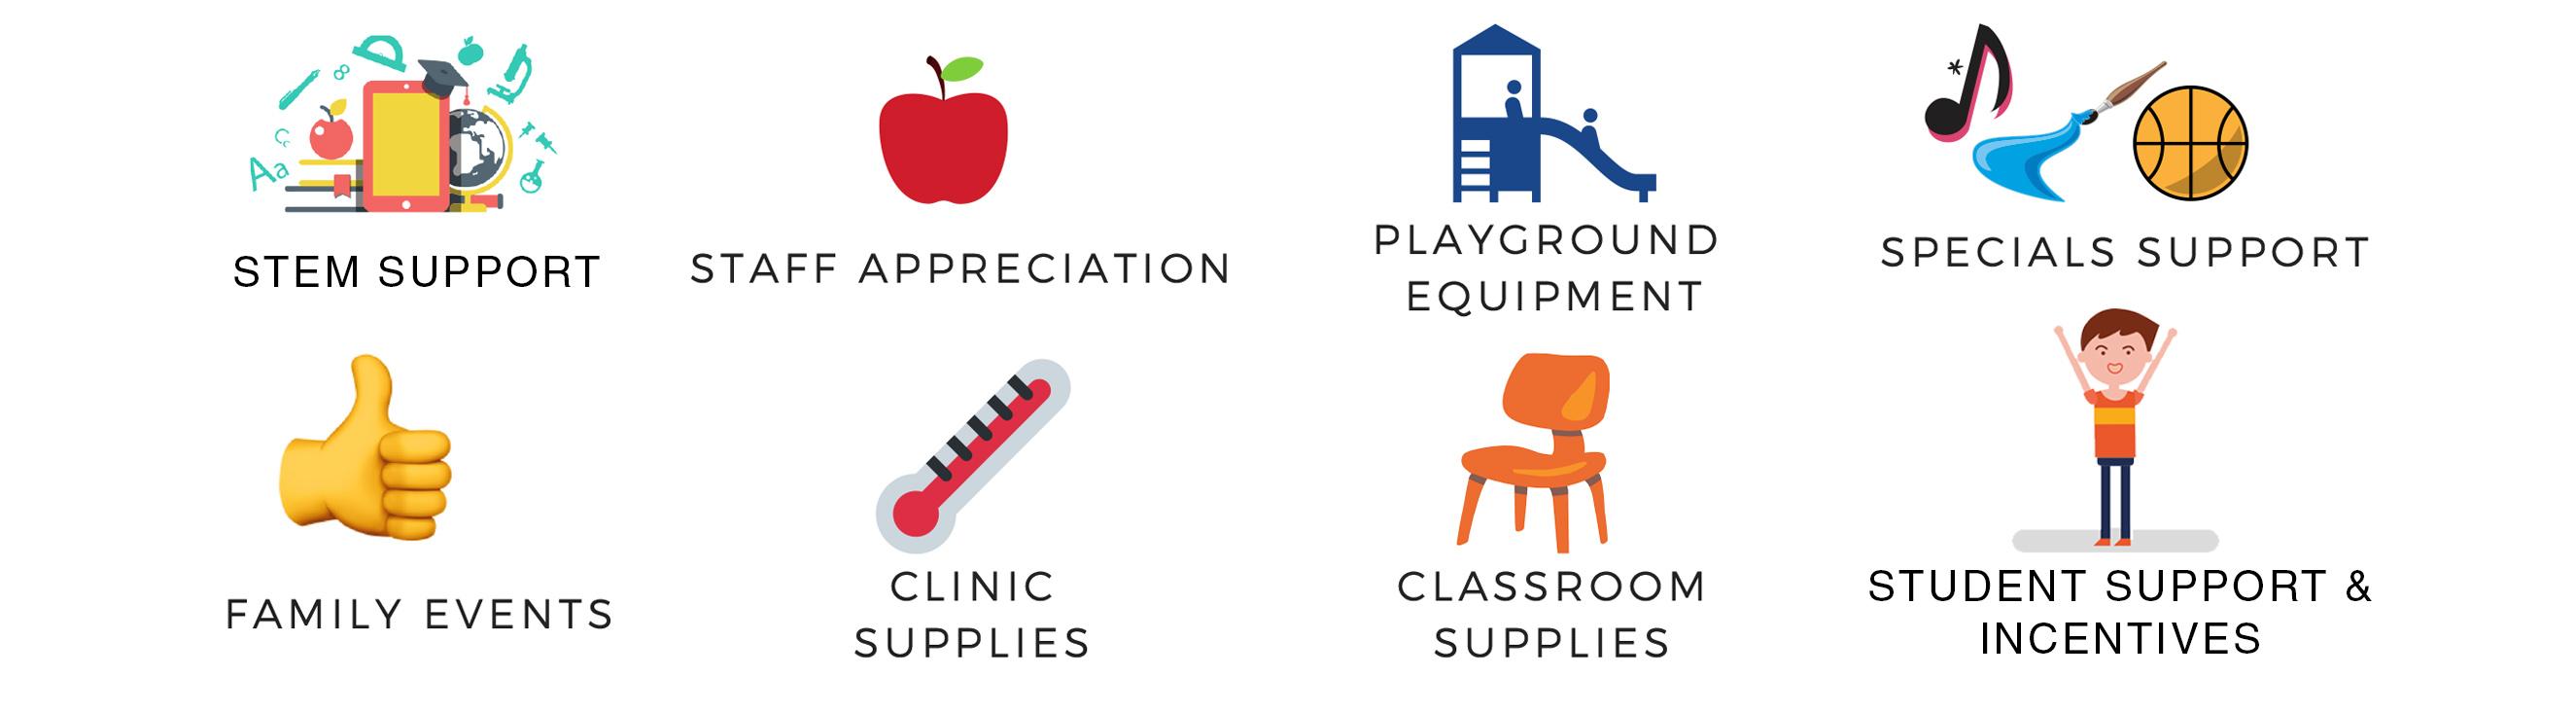 ptsa activities and programs